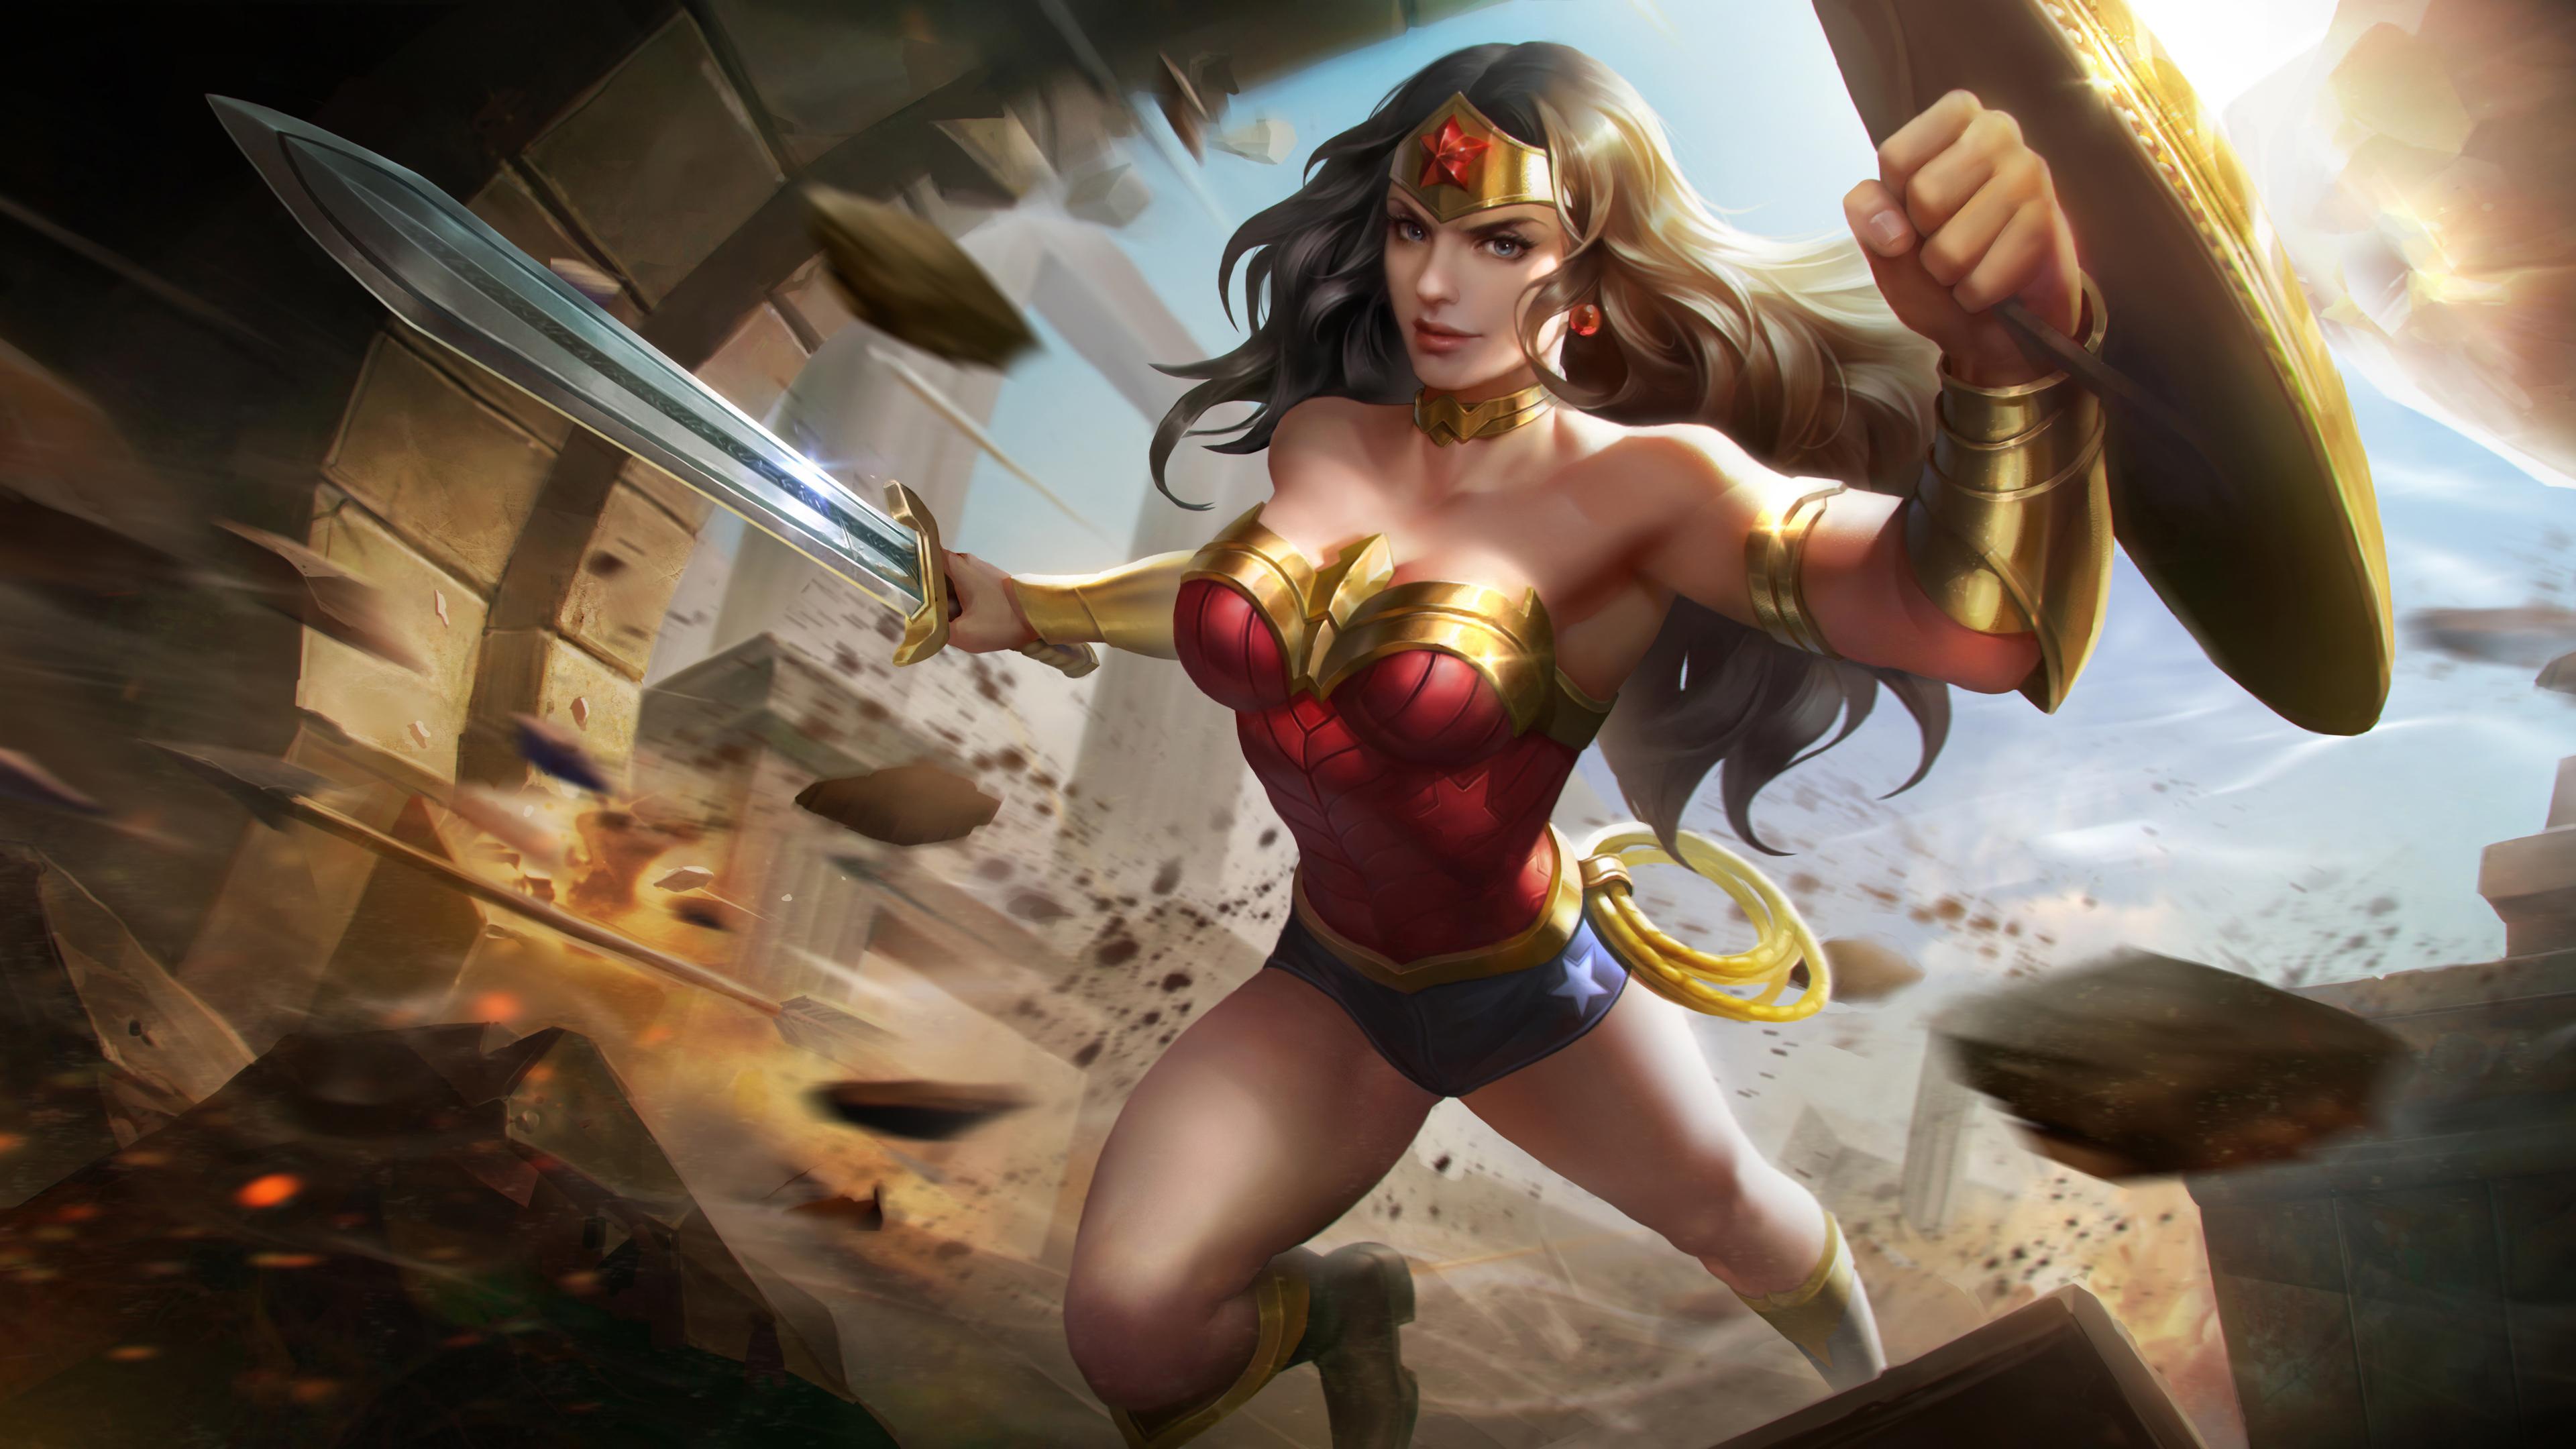 Wallpaper 4k Wonder Woman 4k Artworks 4k Wallpapers Artwork